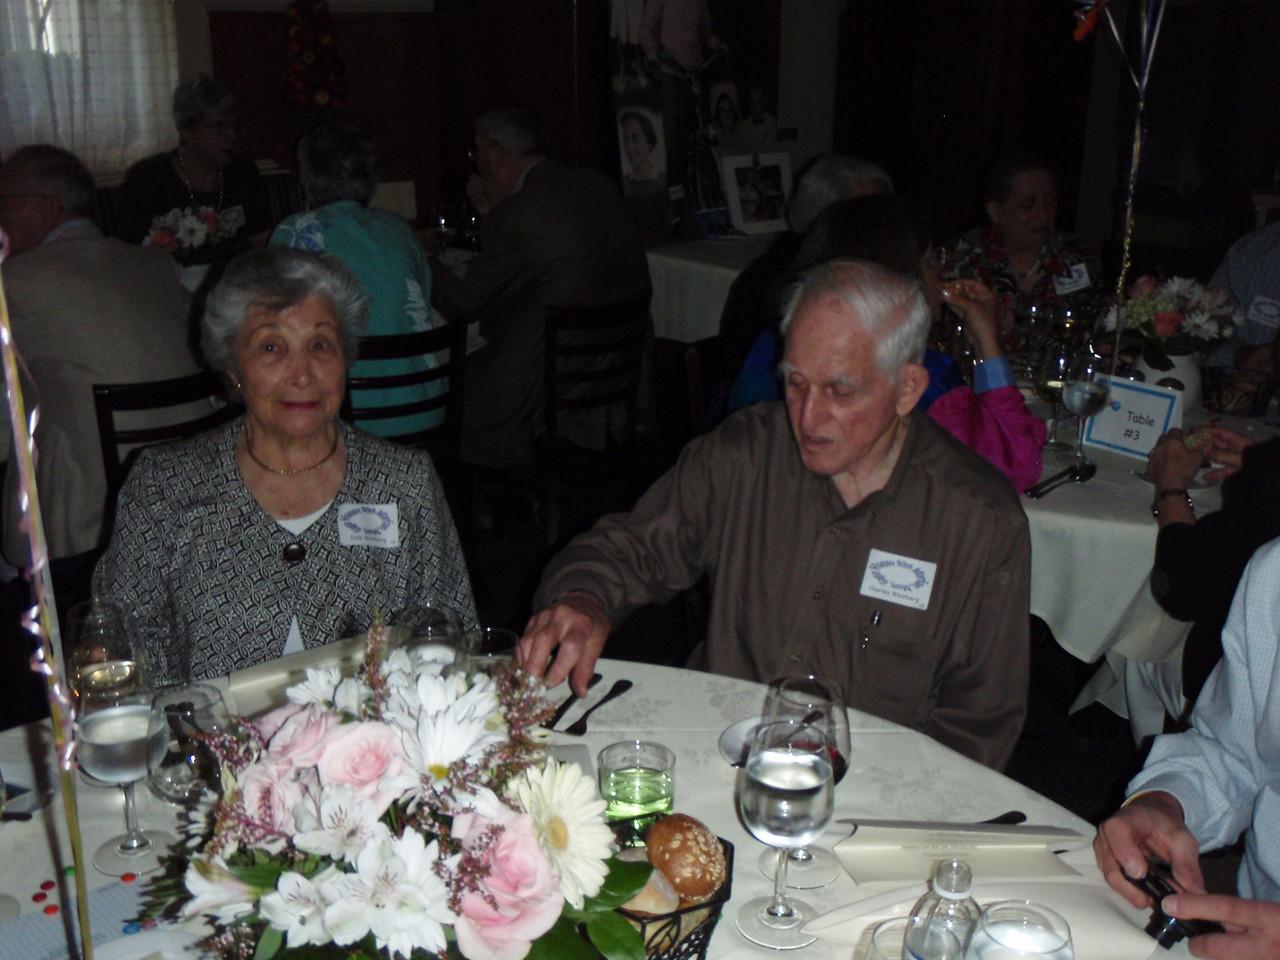 Judy and Charles